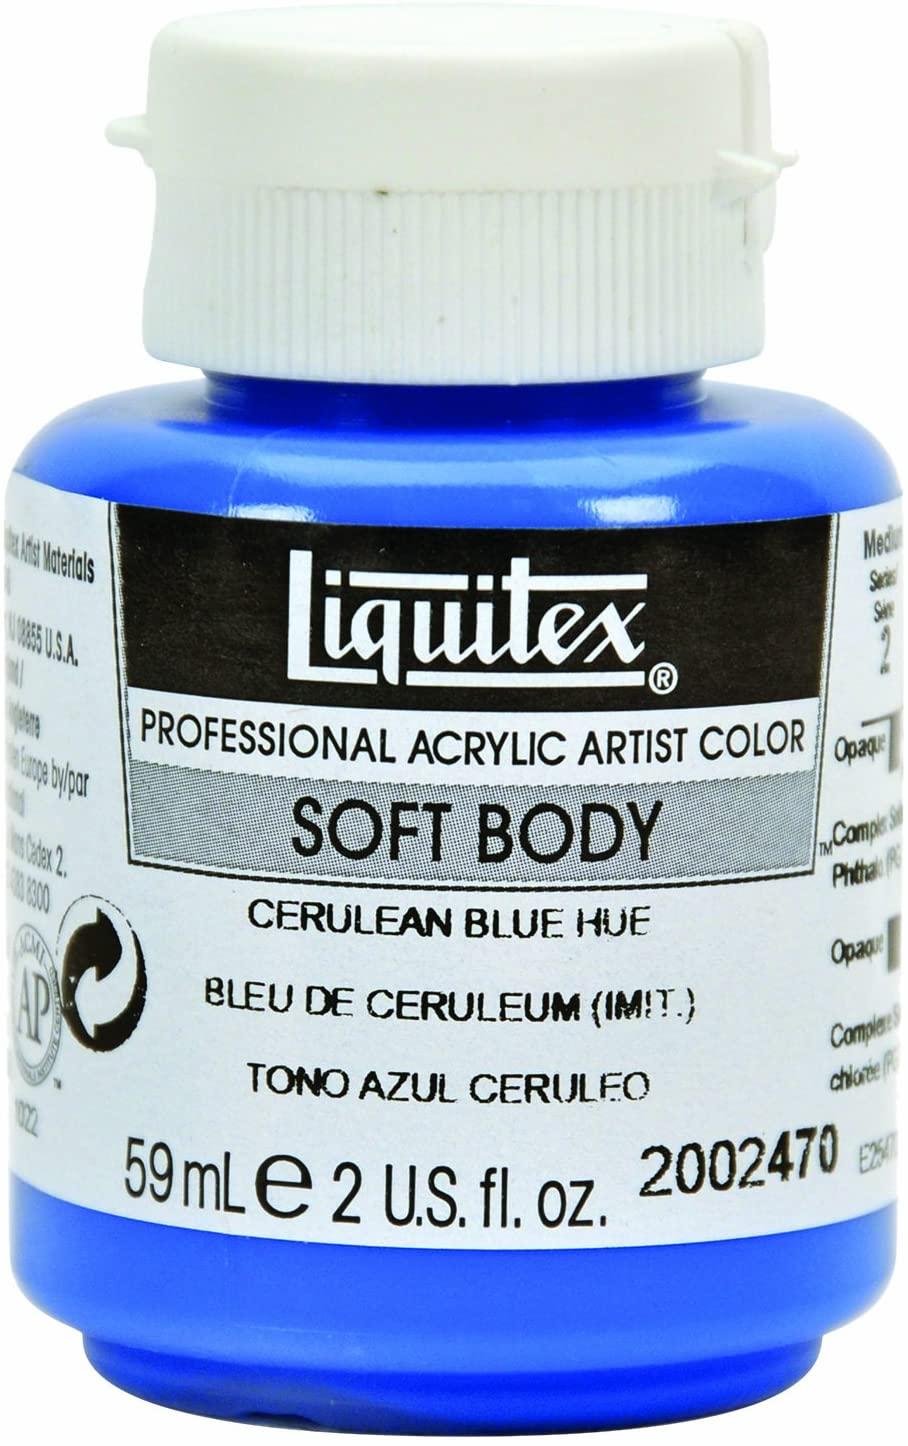 Liquitex 2002470 Professional Soft Body Acrylic Paint 2-oz jar, Cerulean Blue Hue